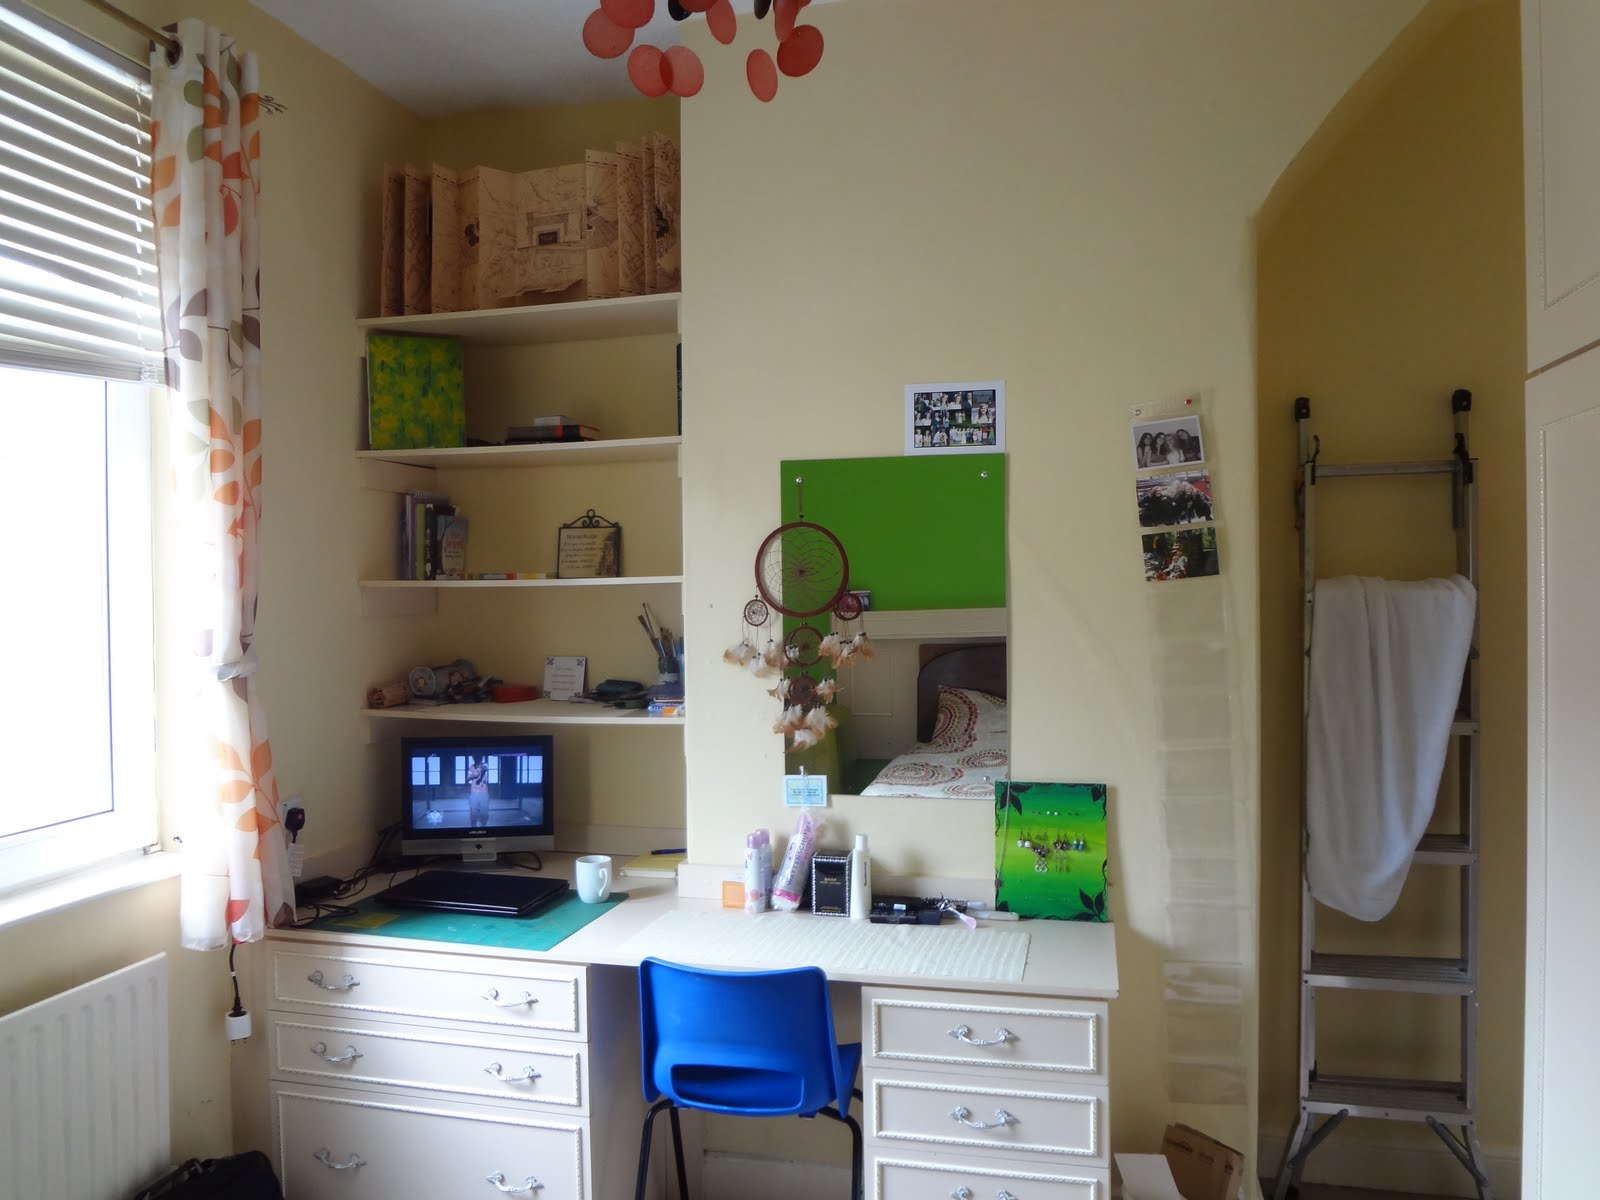 Dailynoted annemarieke en drie verschillende slaapkamers - Slaapkamer om te versieren ...